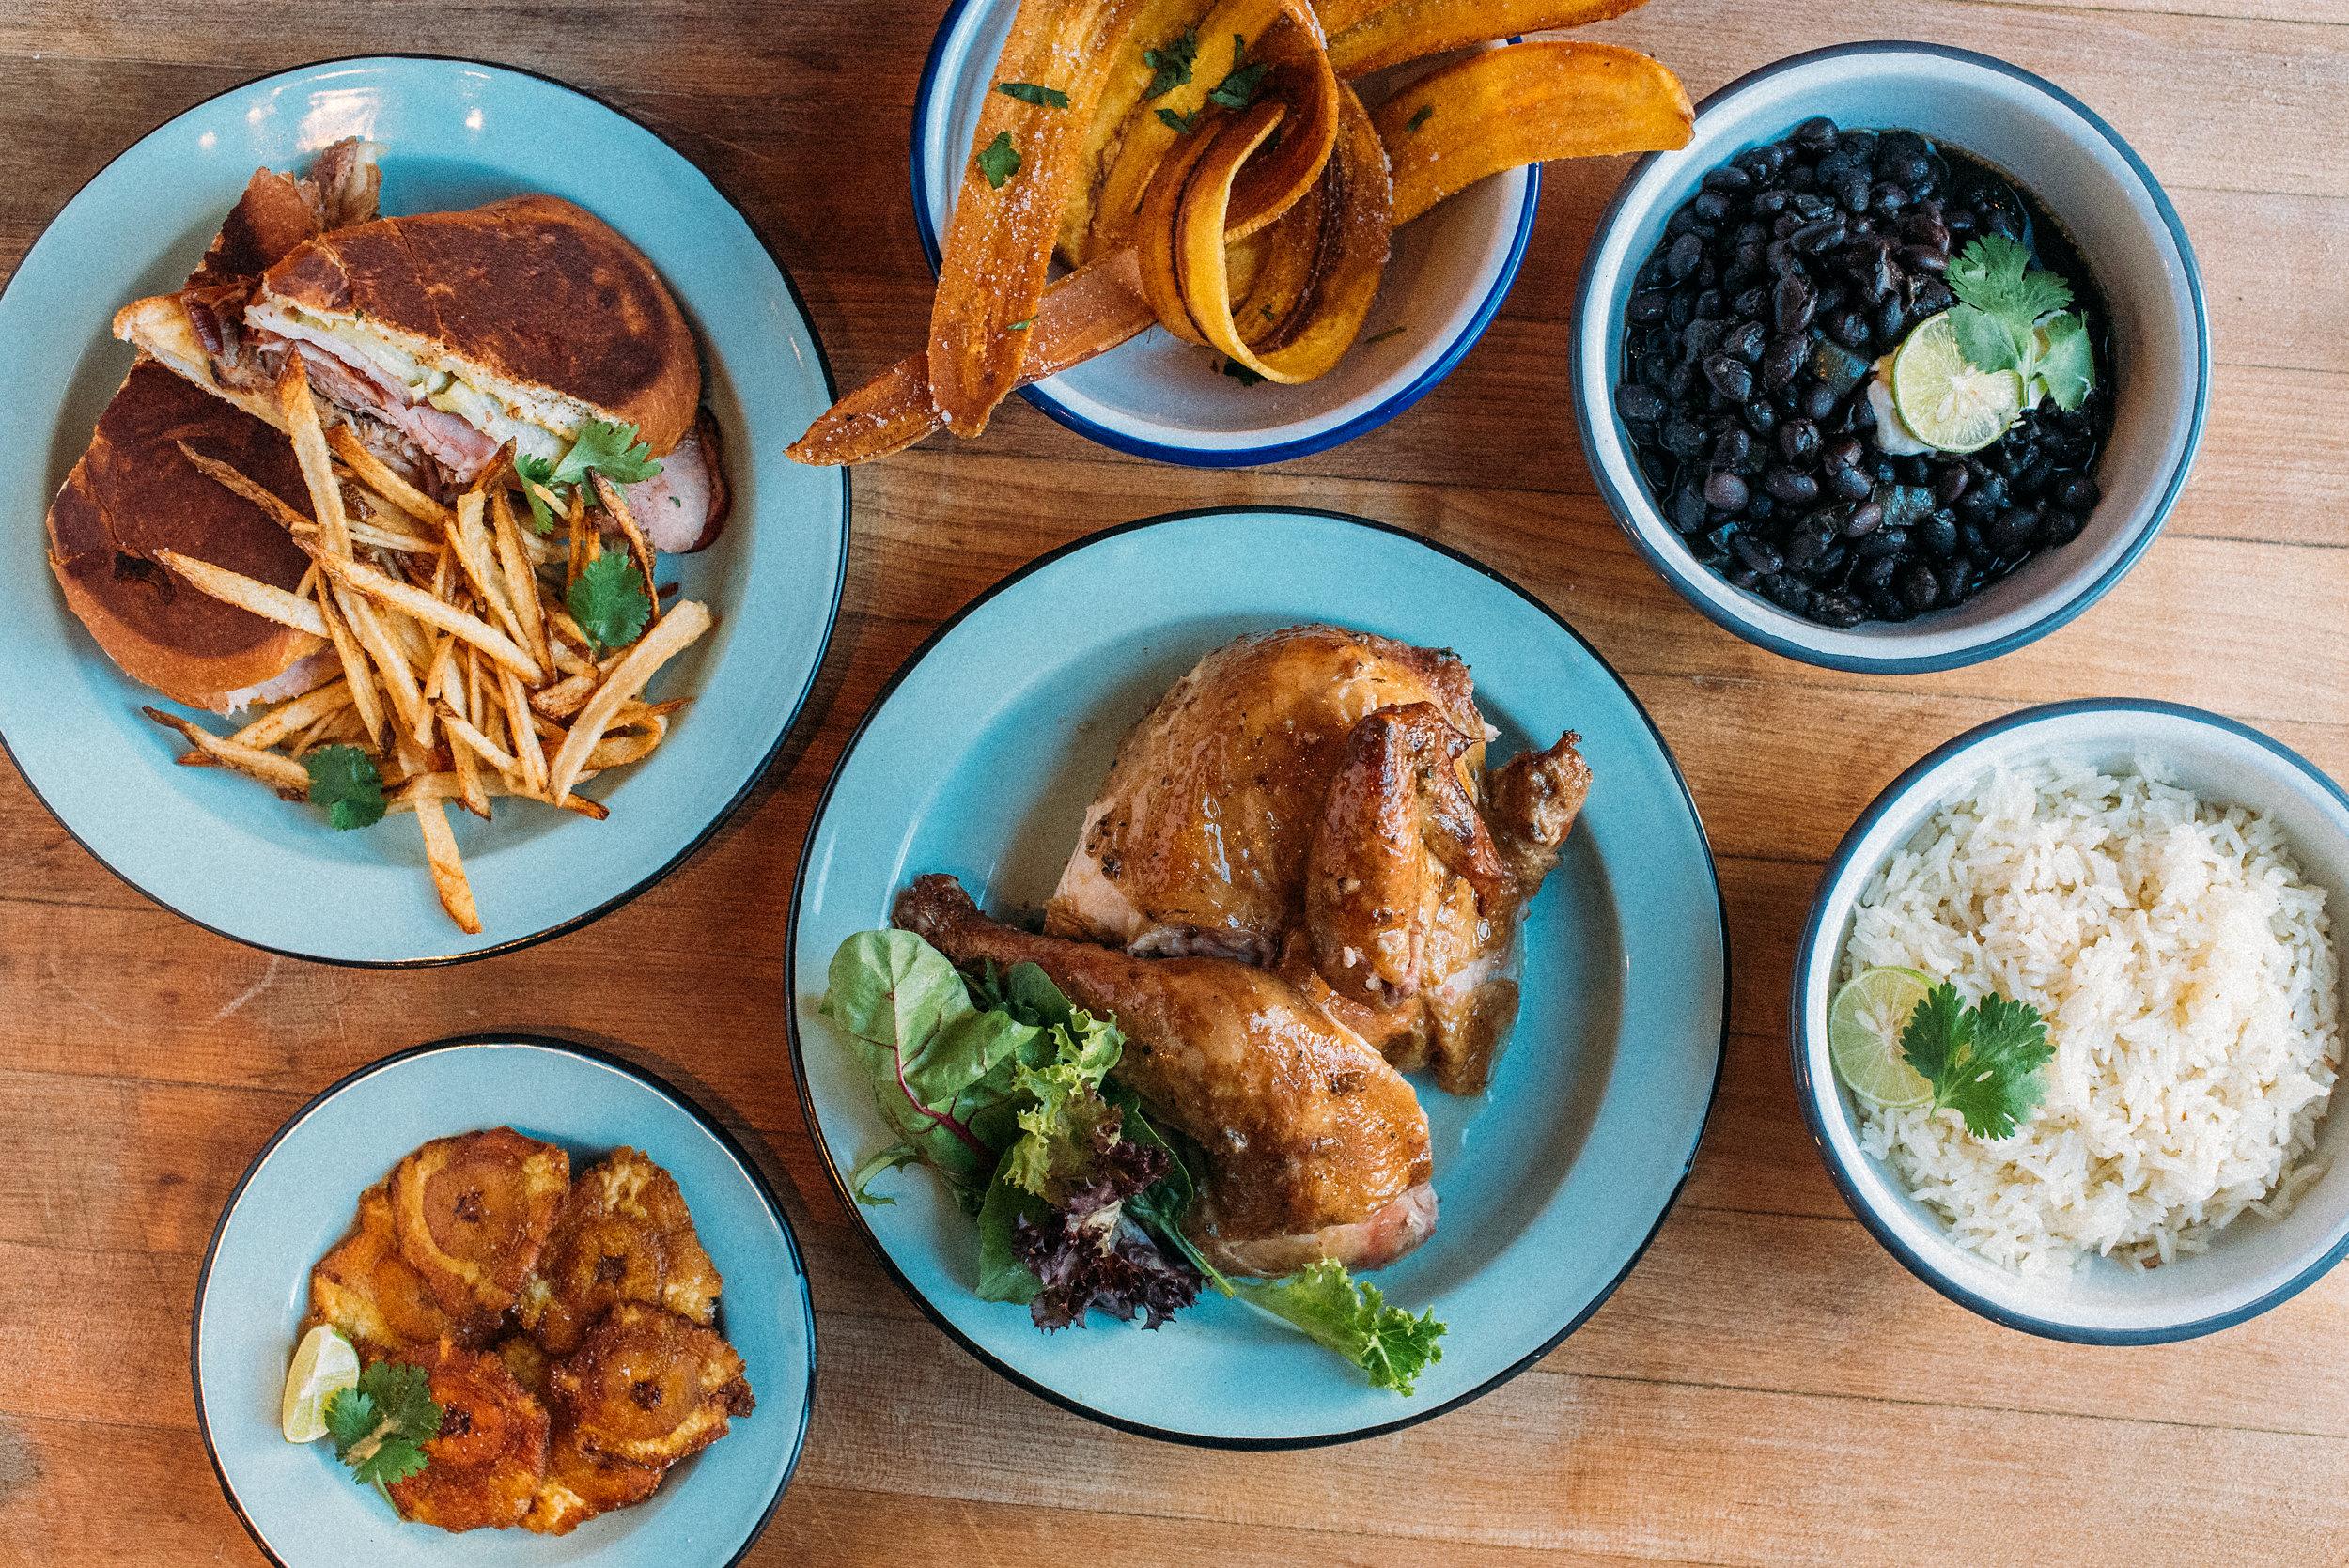 A spread of food at Isla Vida